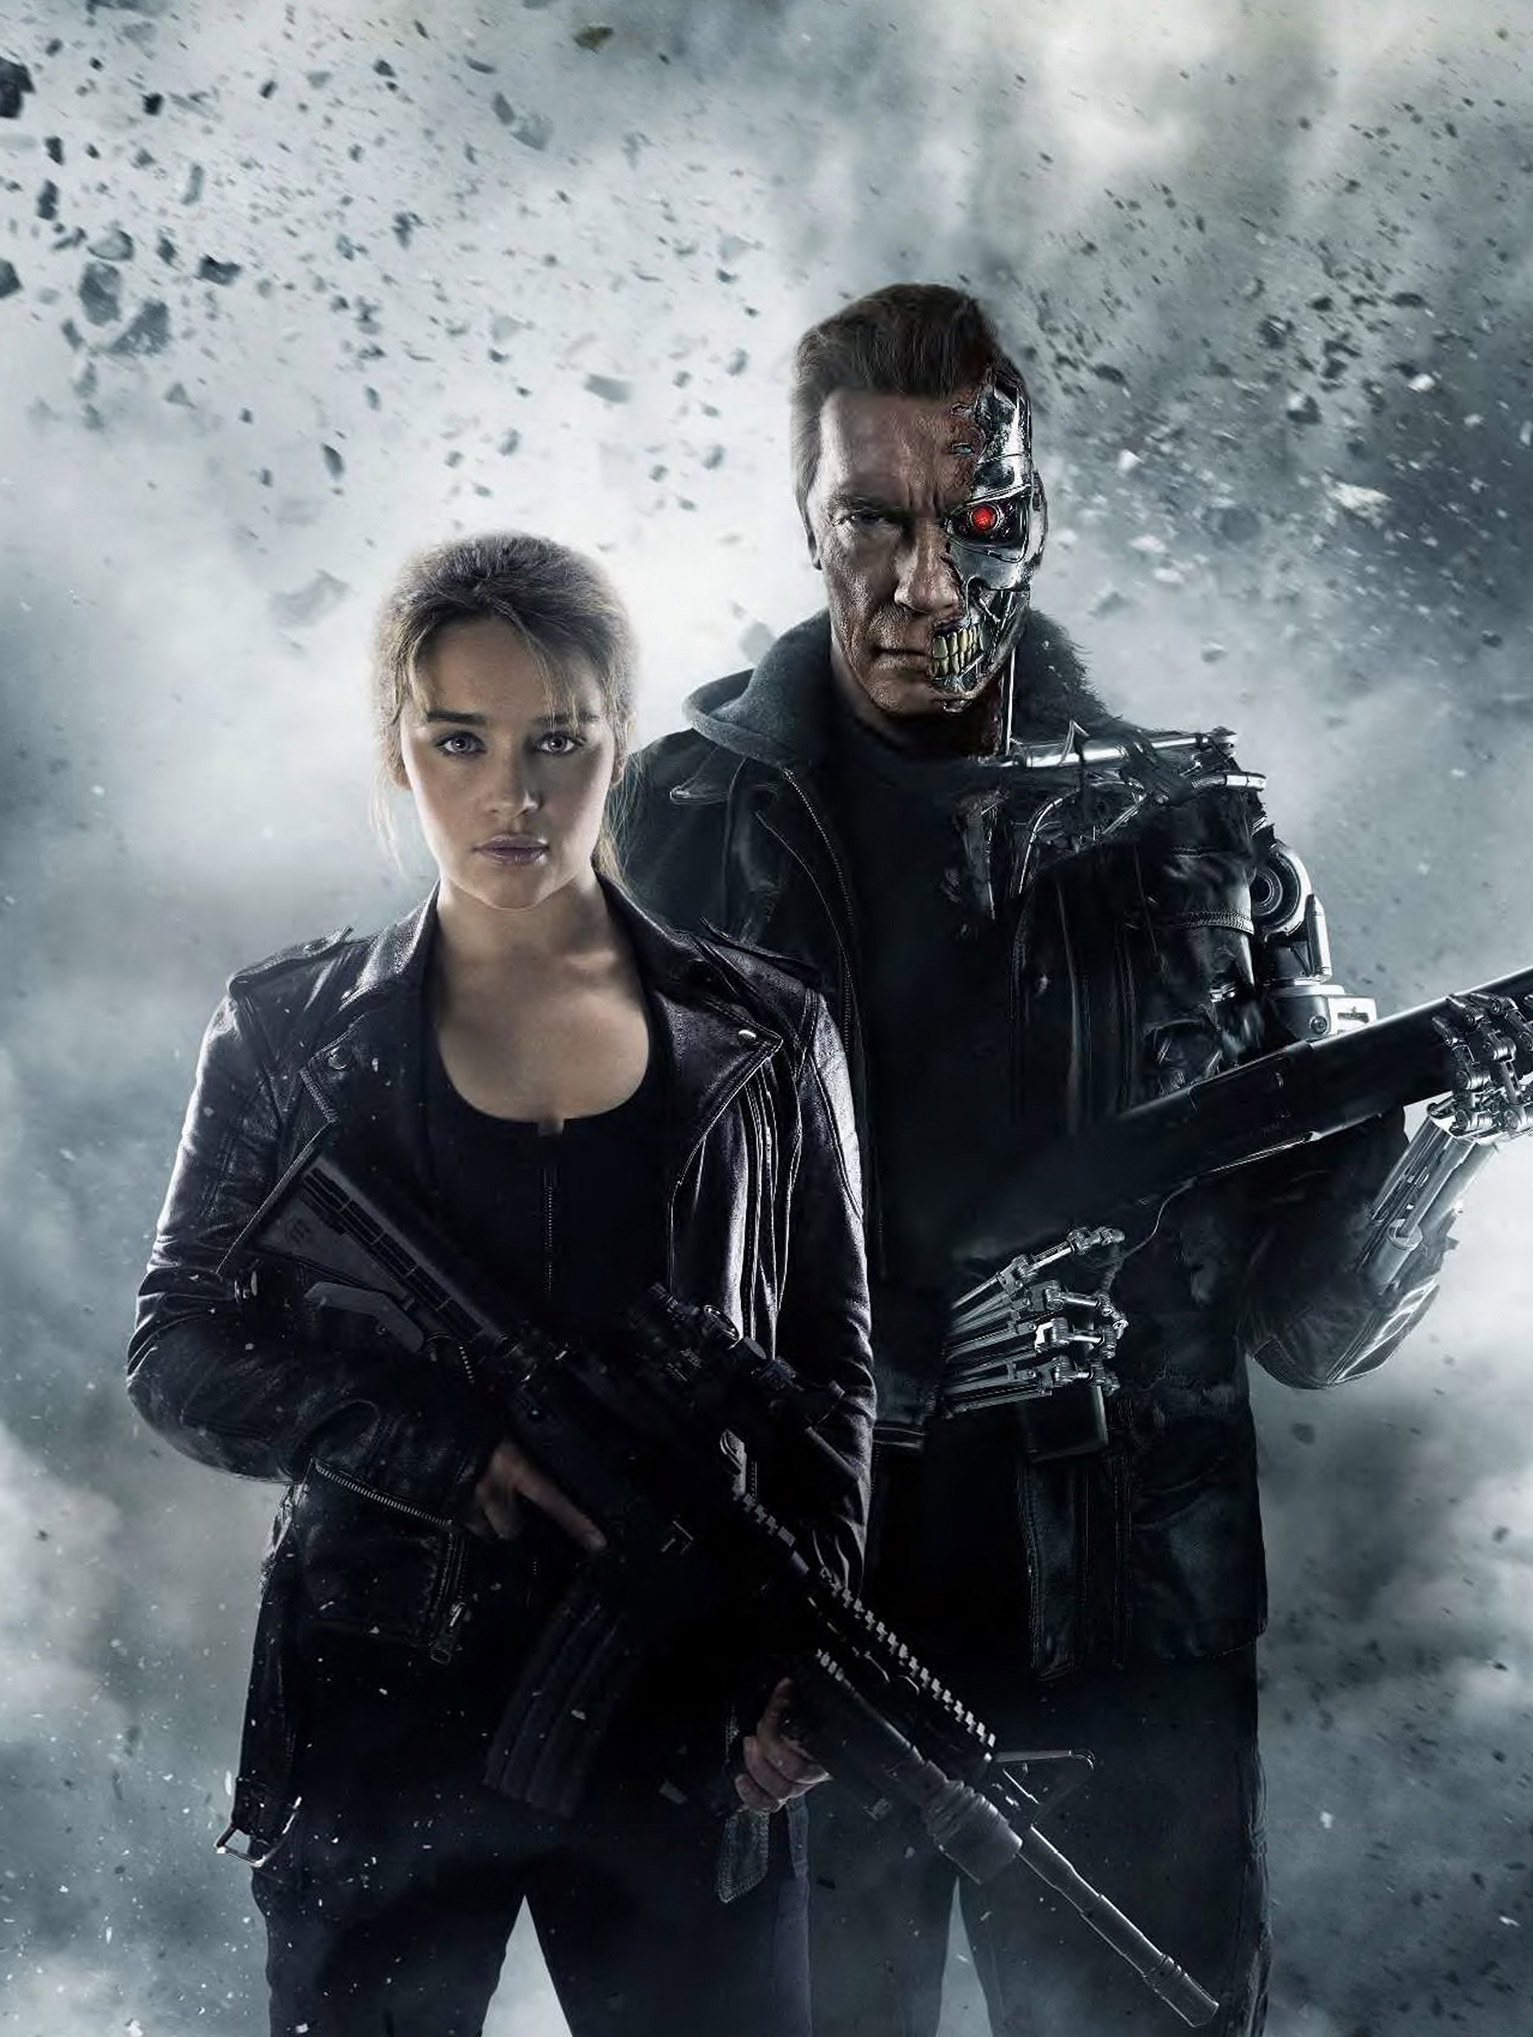 2015-terminator-genisys-film-review-empire